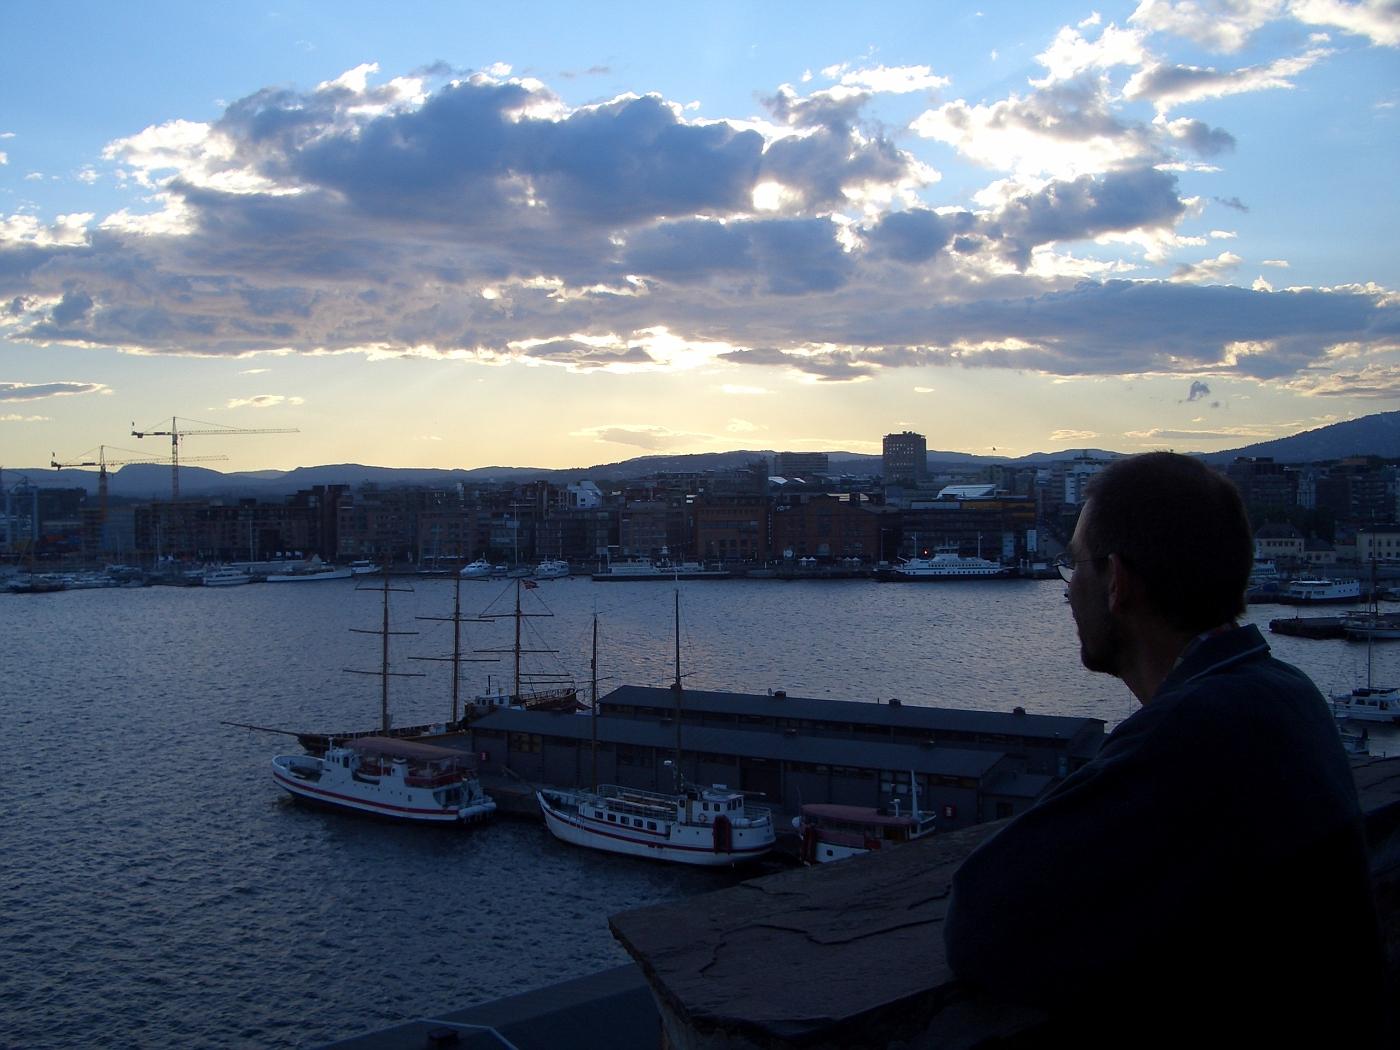 Andreas im Hafen Oslo